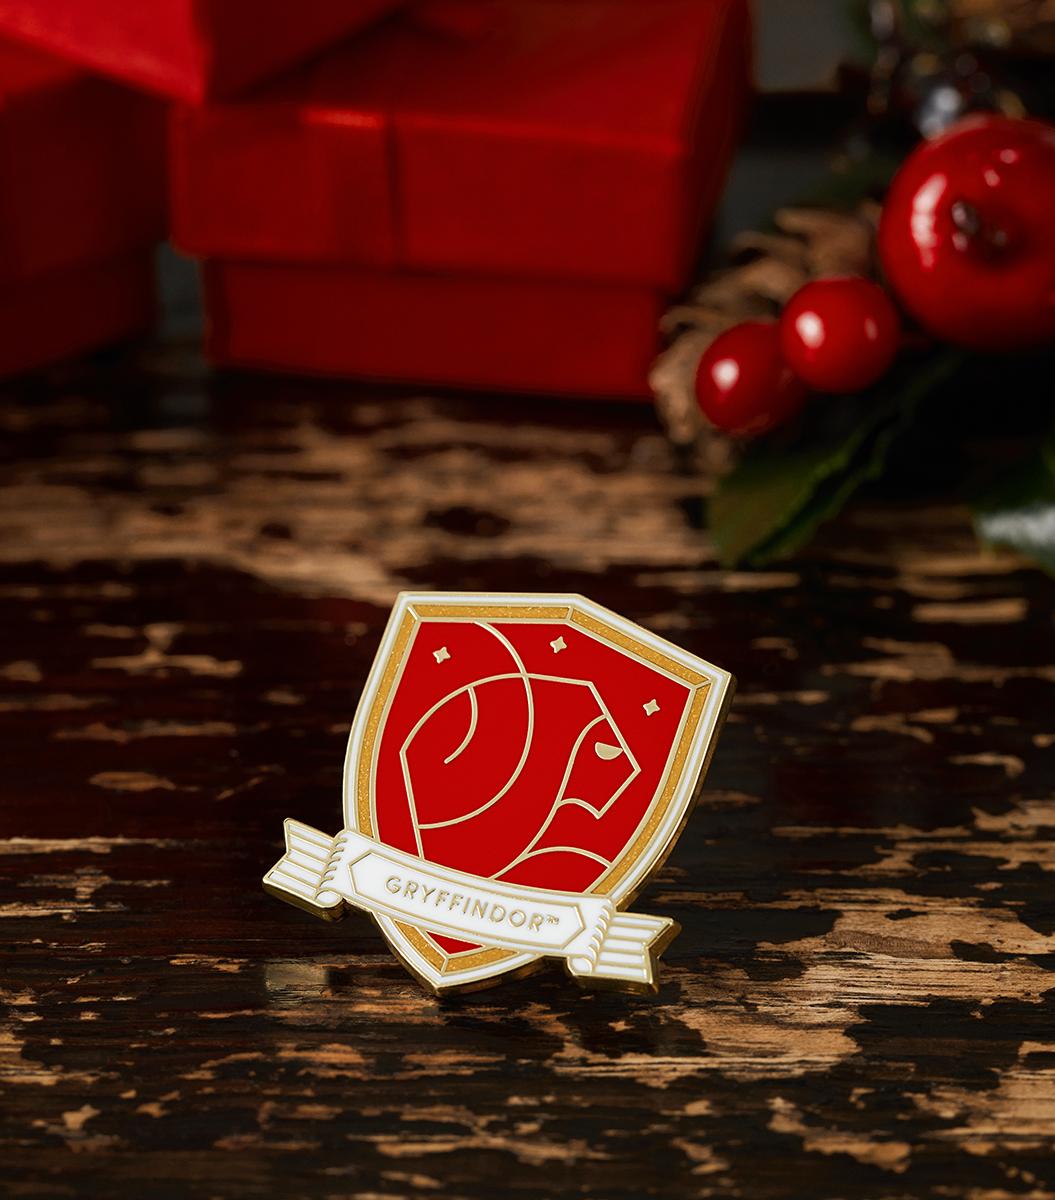 Gryffindor™ House Crest Enamel Pin